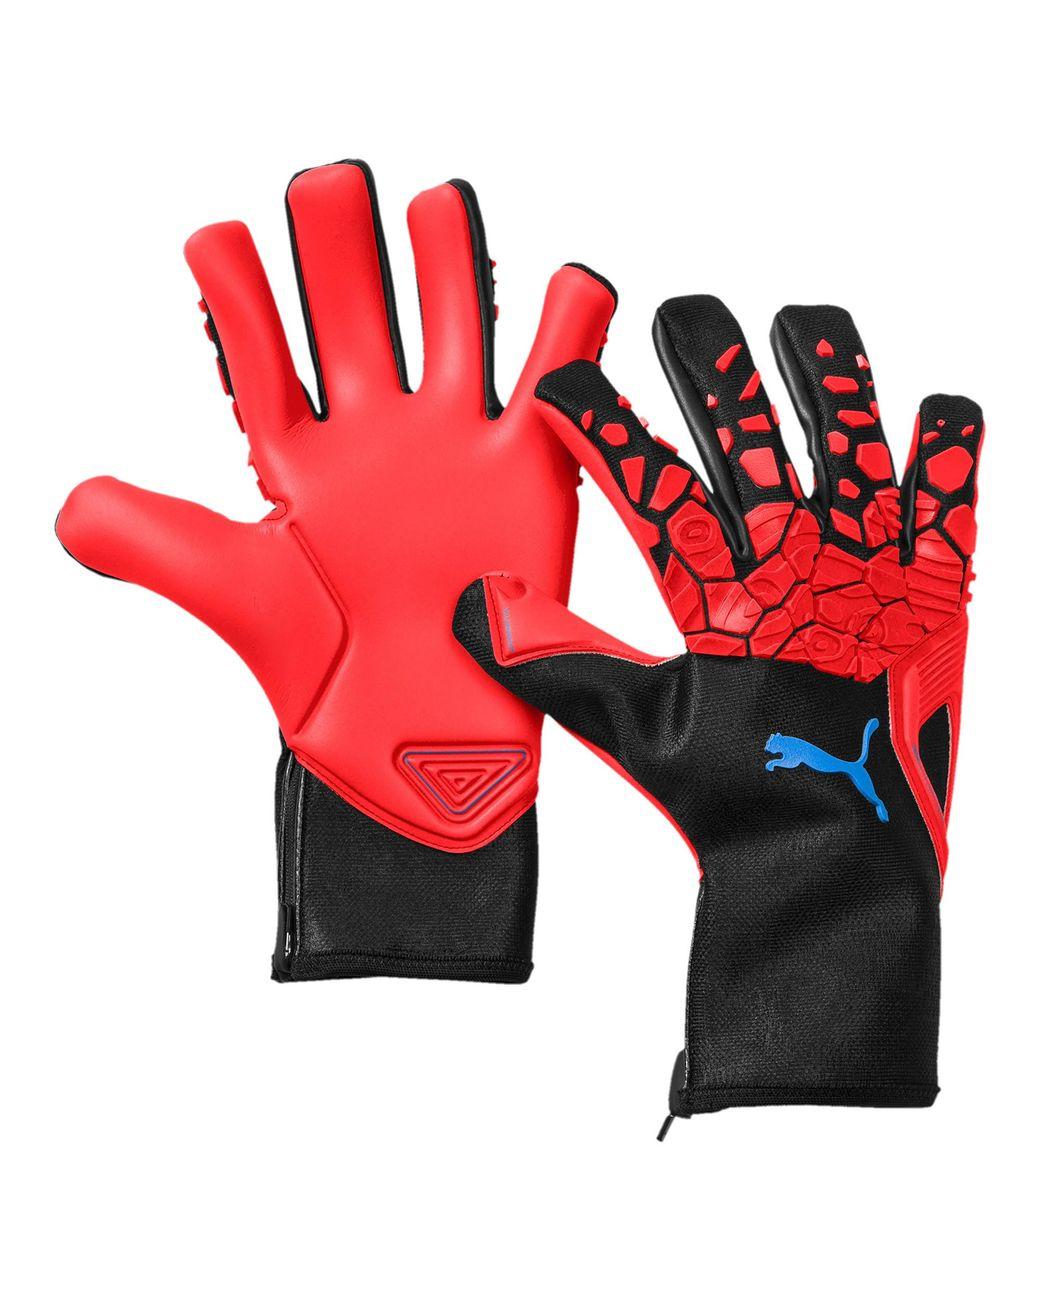 ff386b25f541 Lyst - PUMA Future Grip 2.1 Goalkeeper Gloves in Red for Men